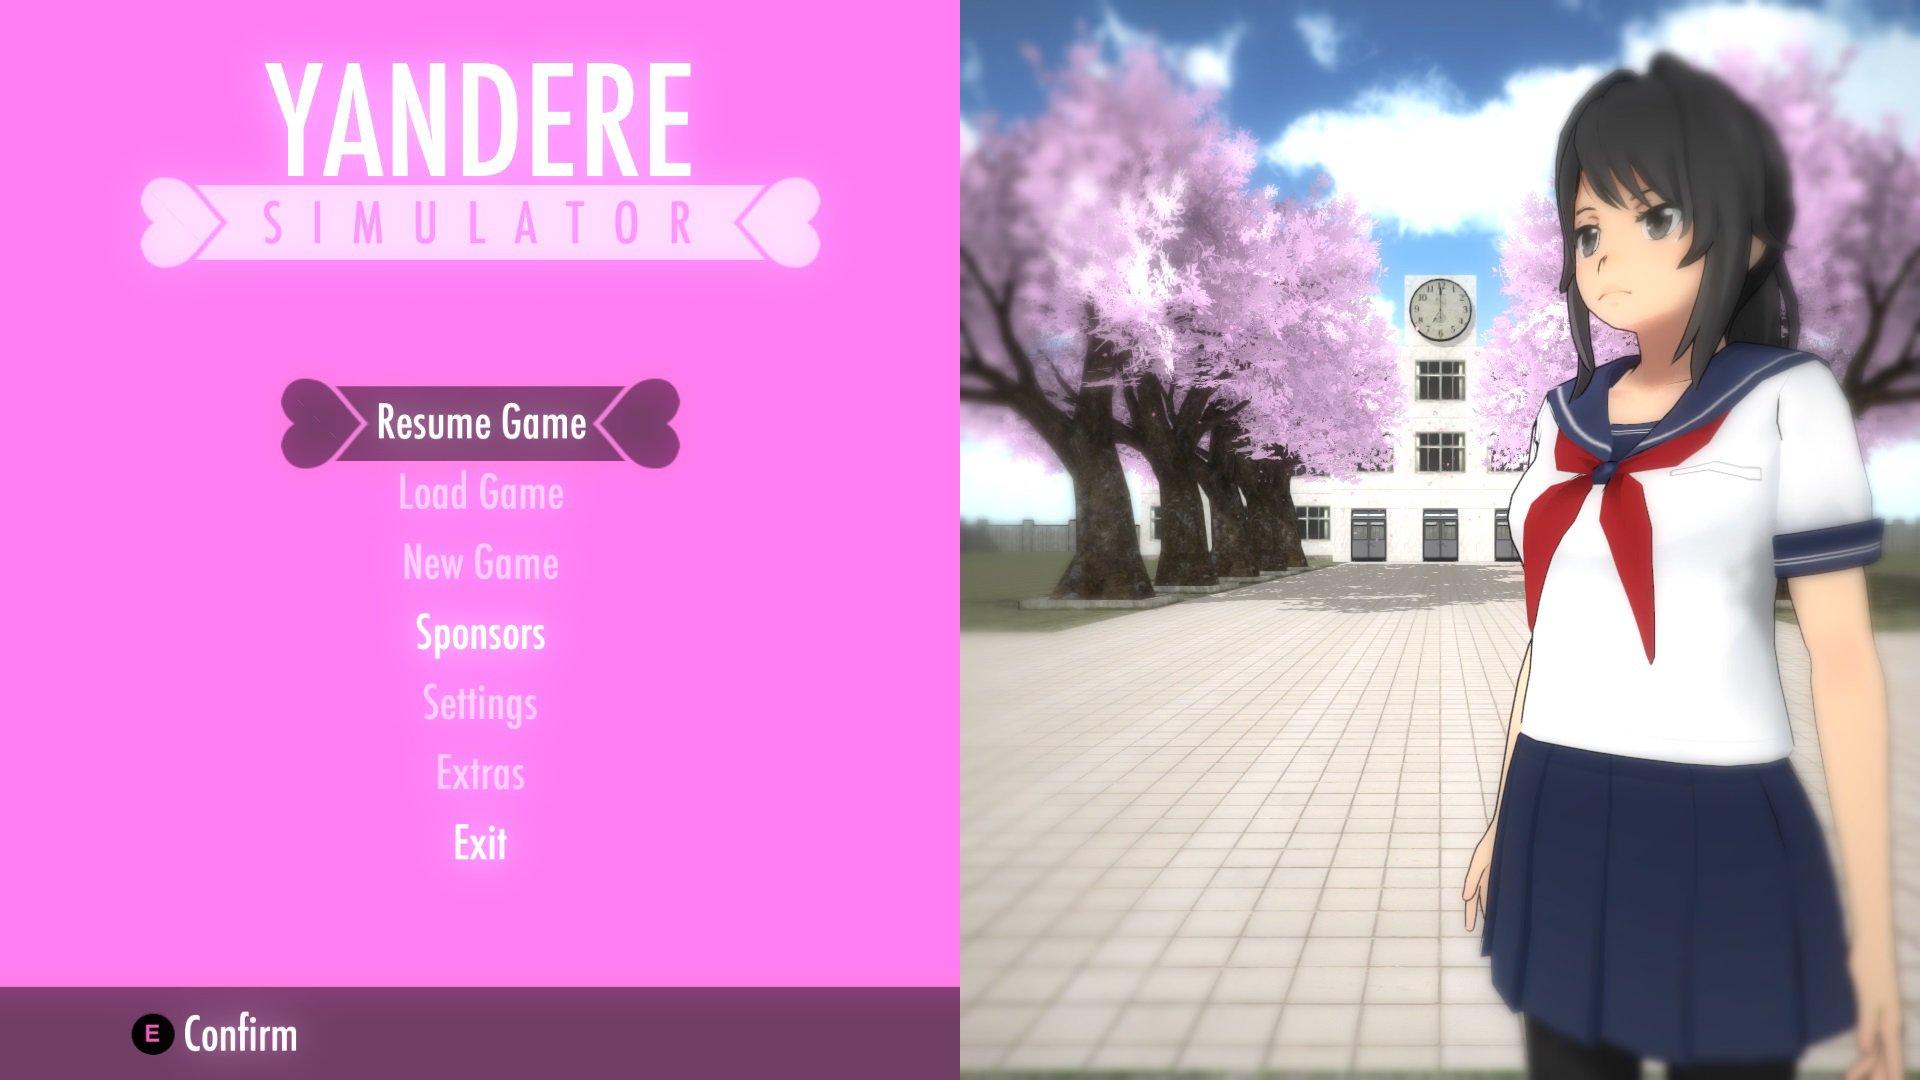 Yandere-Simulator-Title